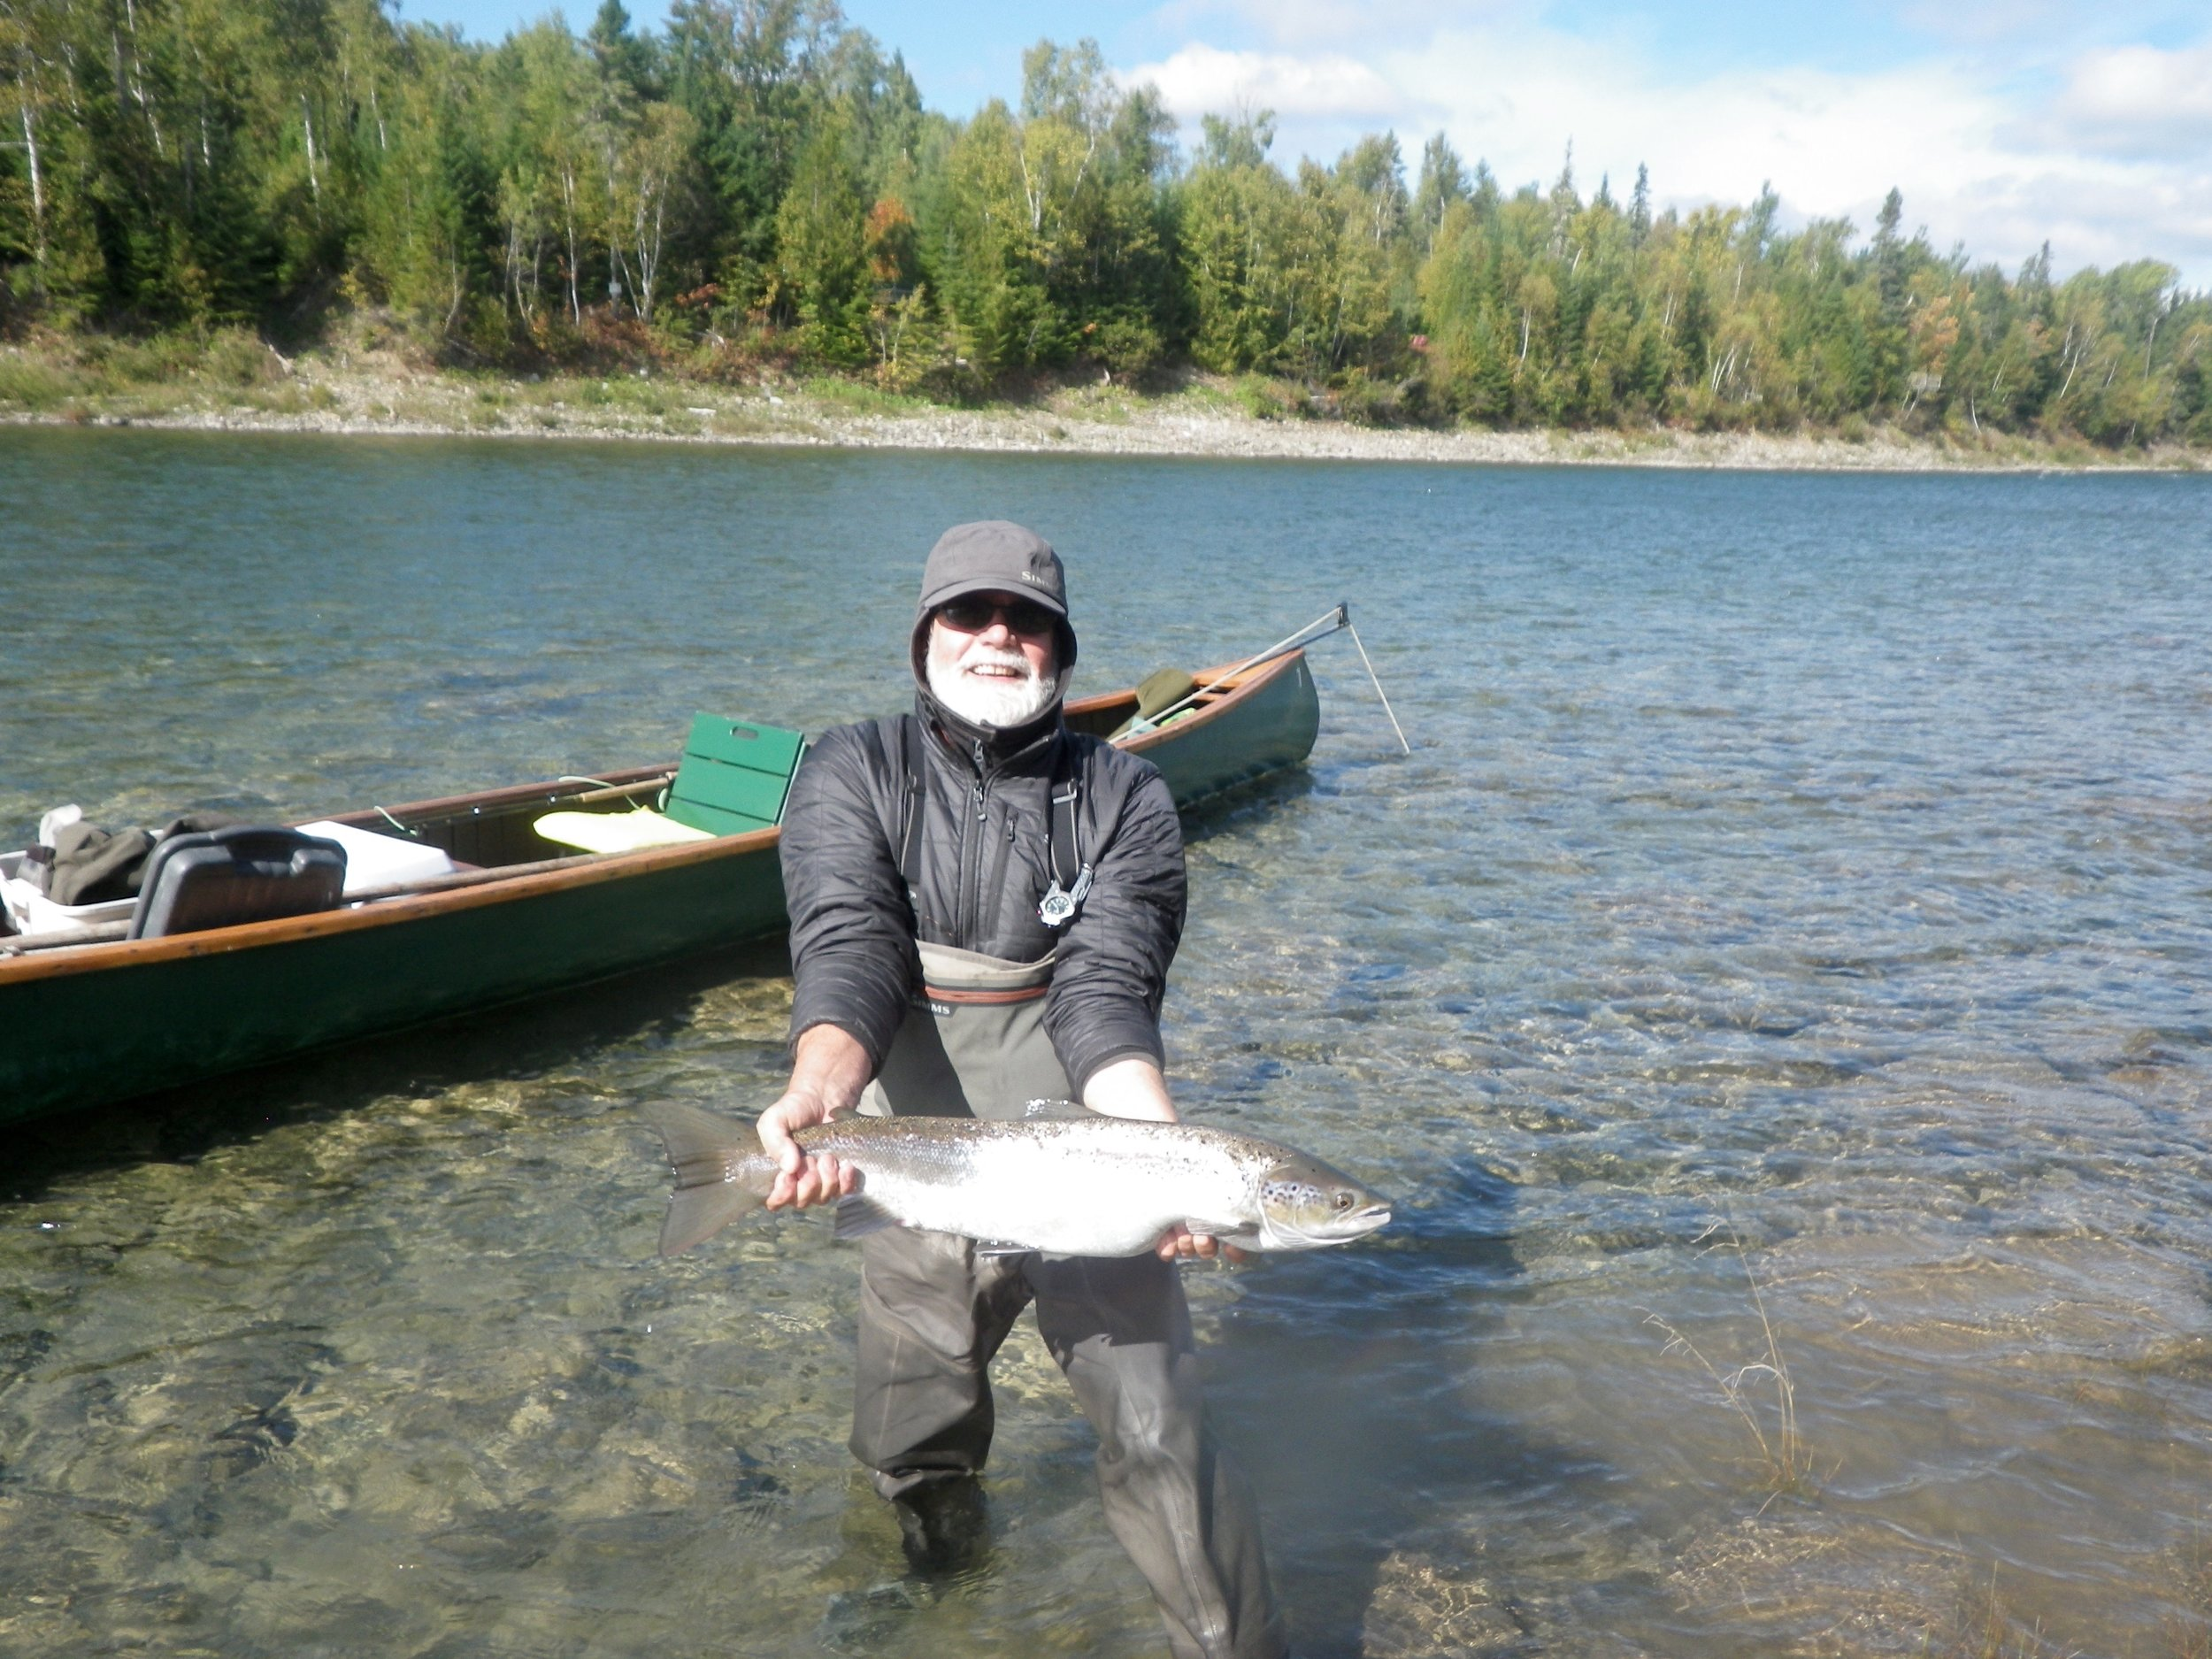 Camp Bonaventure regular Randy Spencer with a fresh run September salmon on the Bonaventure. Congratulations Randy!